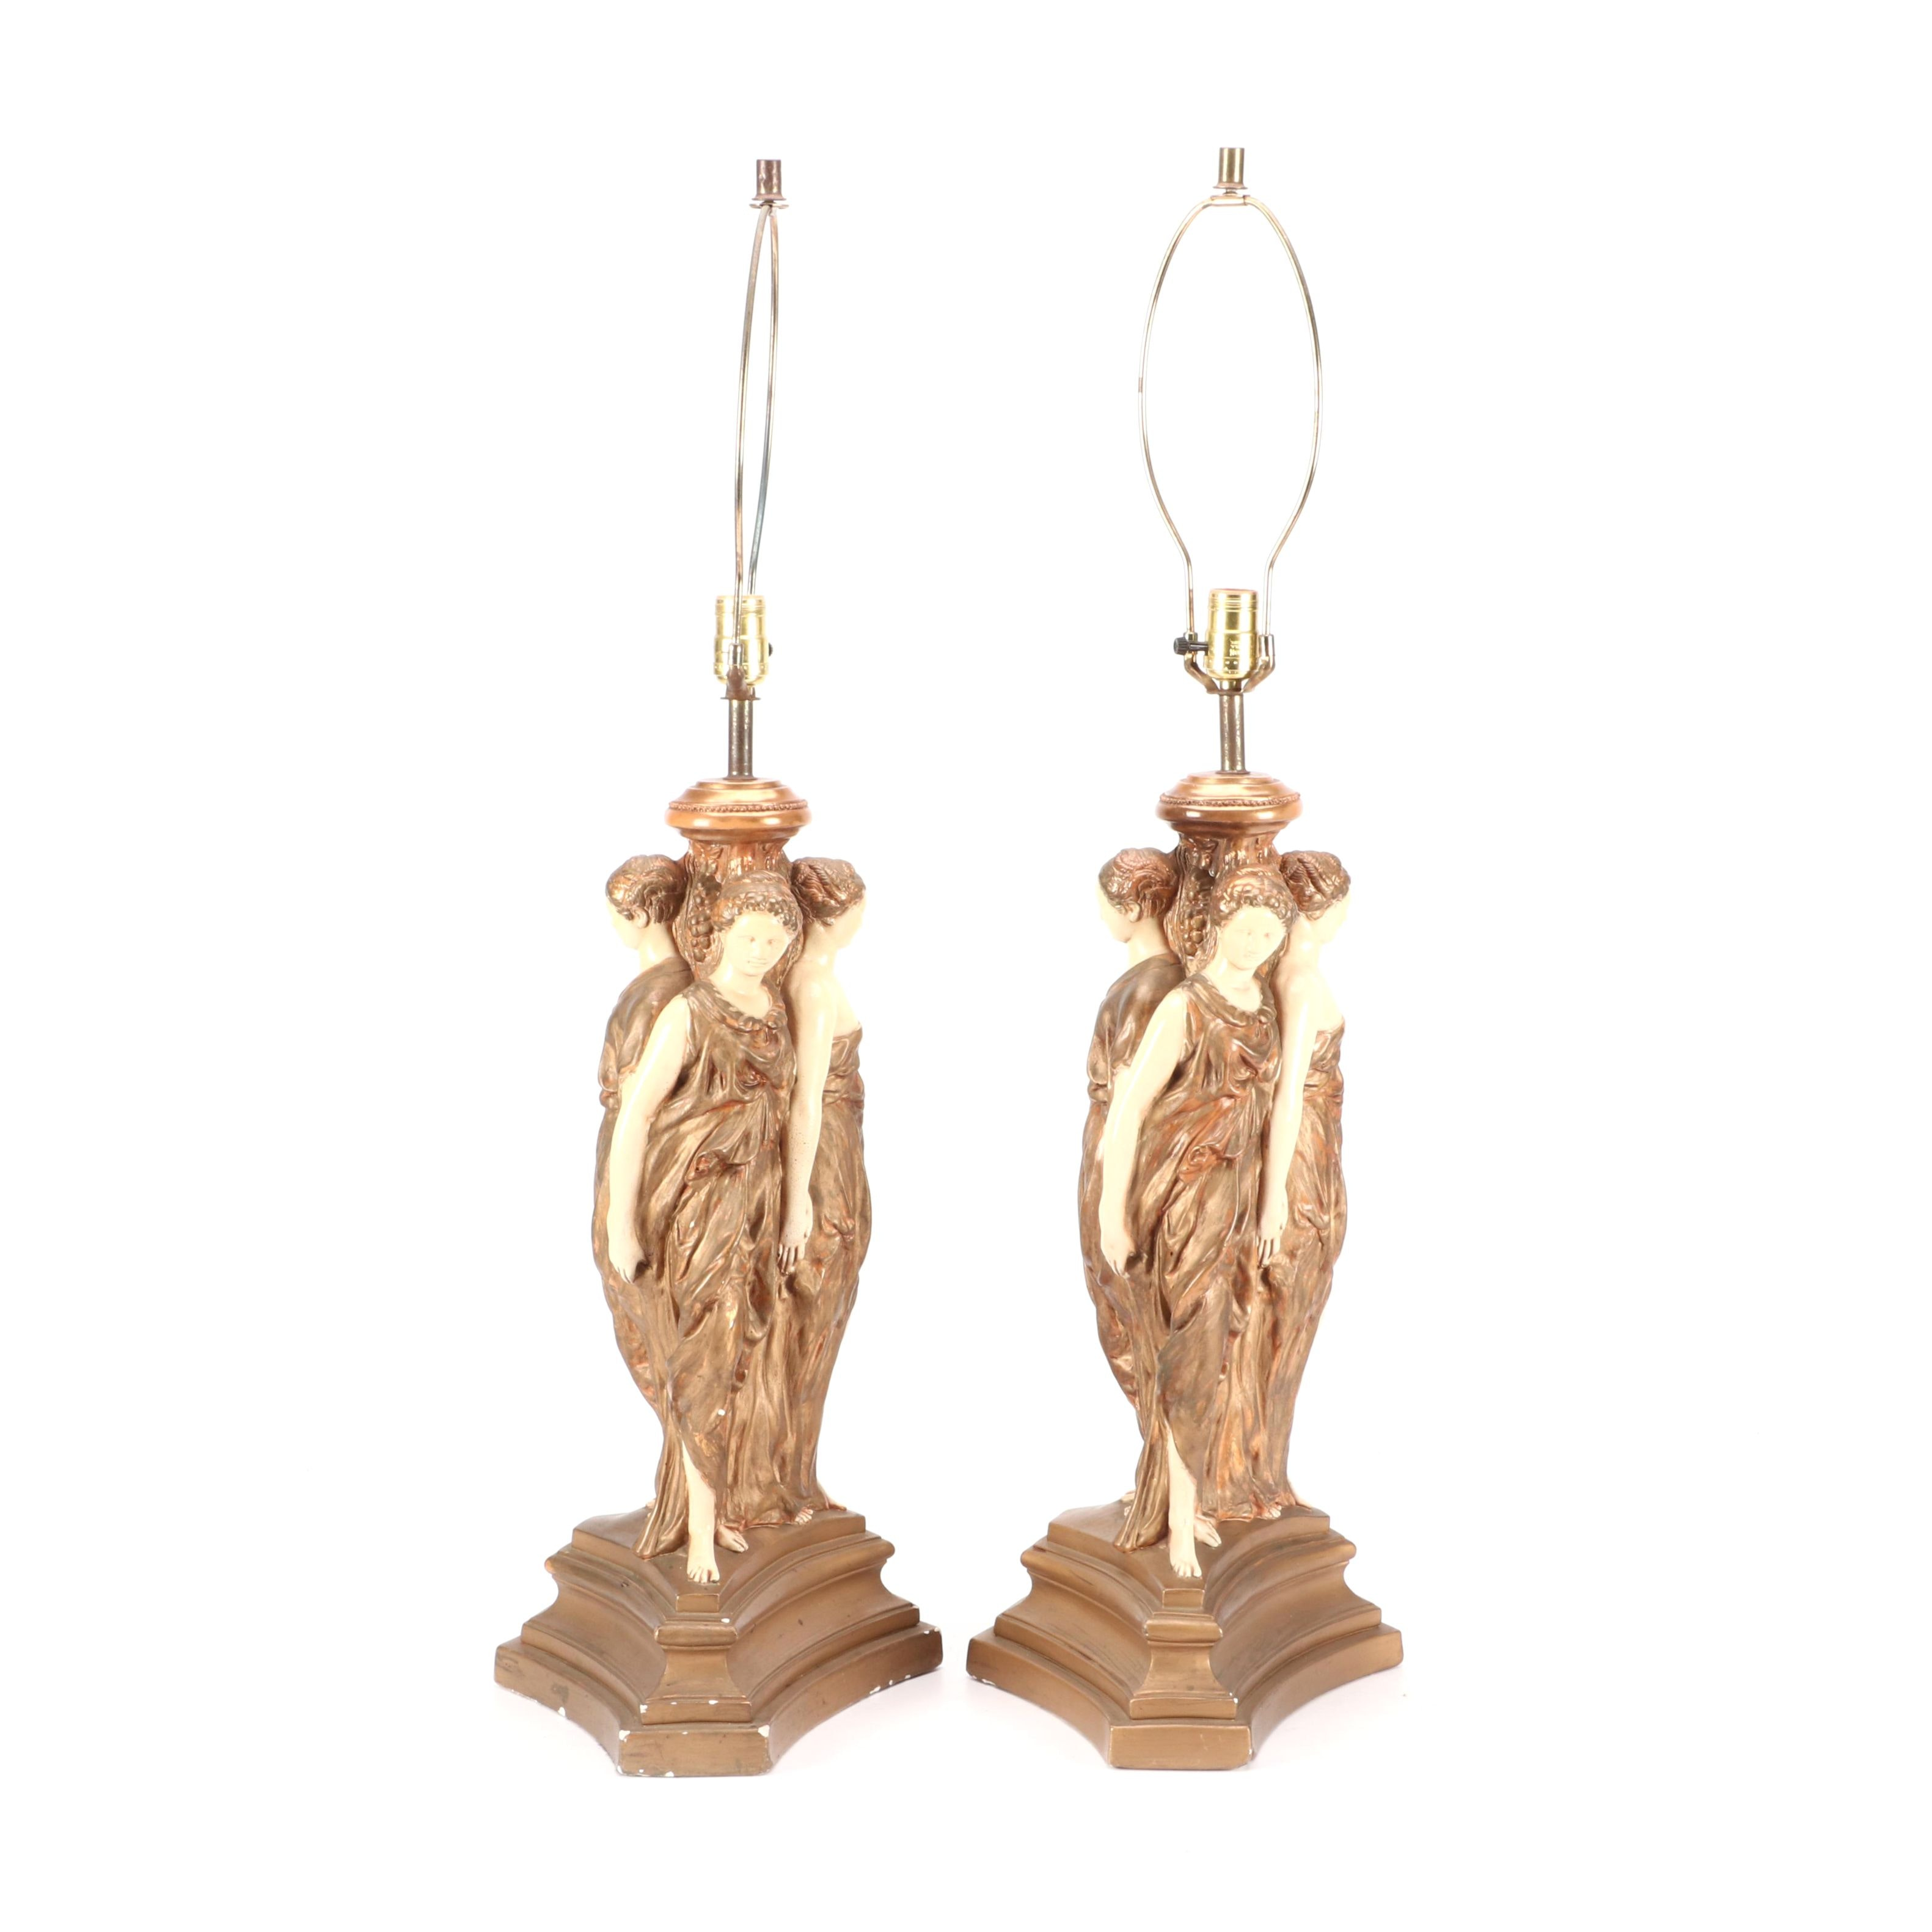 Quartite Creative Corporation Figural Table Lamps